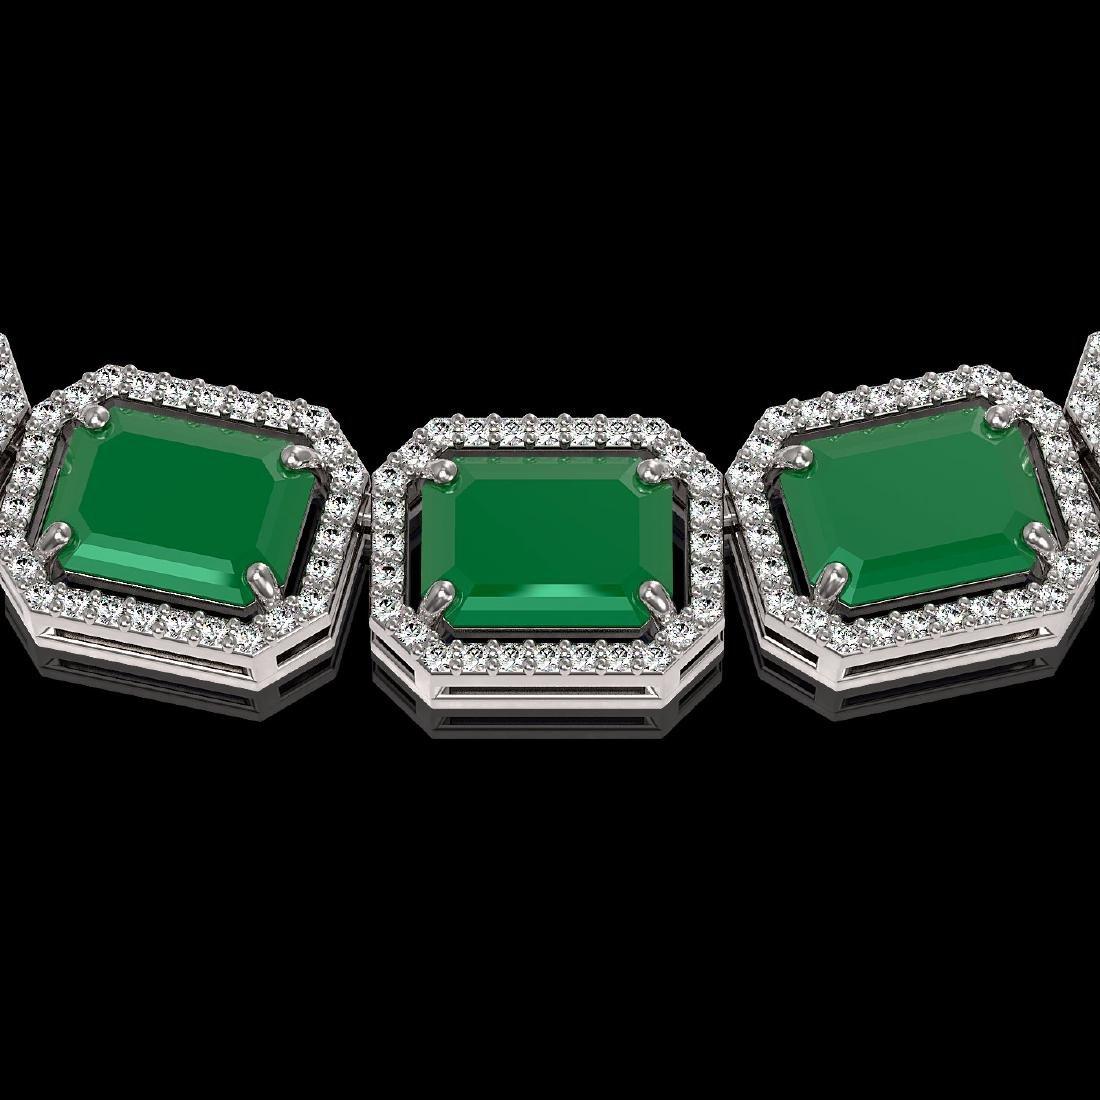 84.94 CTW Emerald & Diamond Halo Necklace 10K White - 3